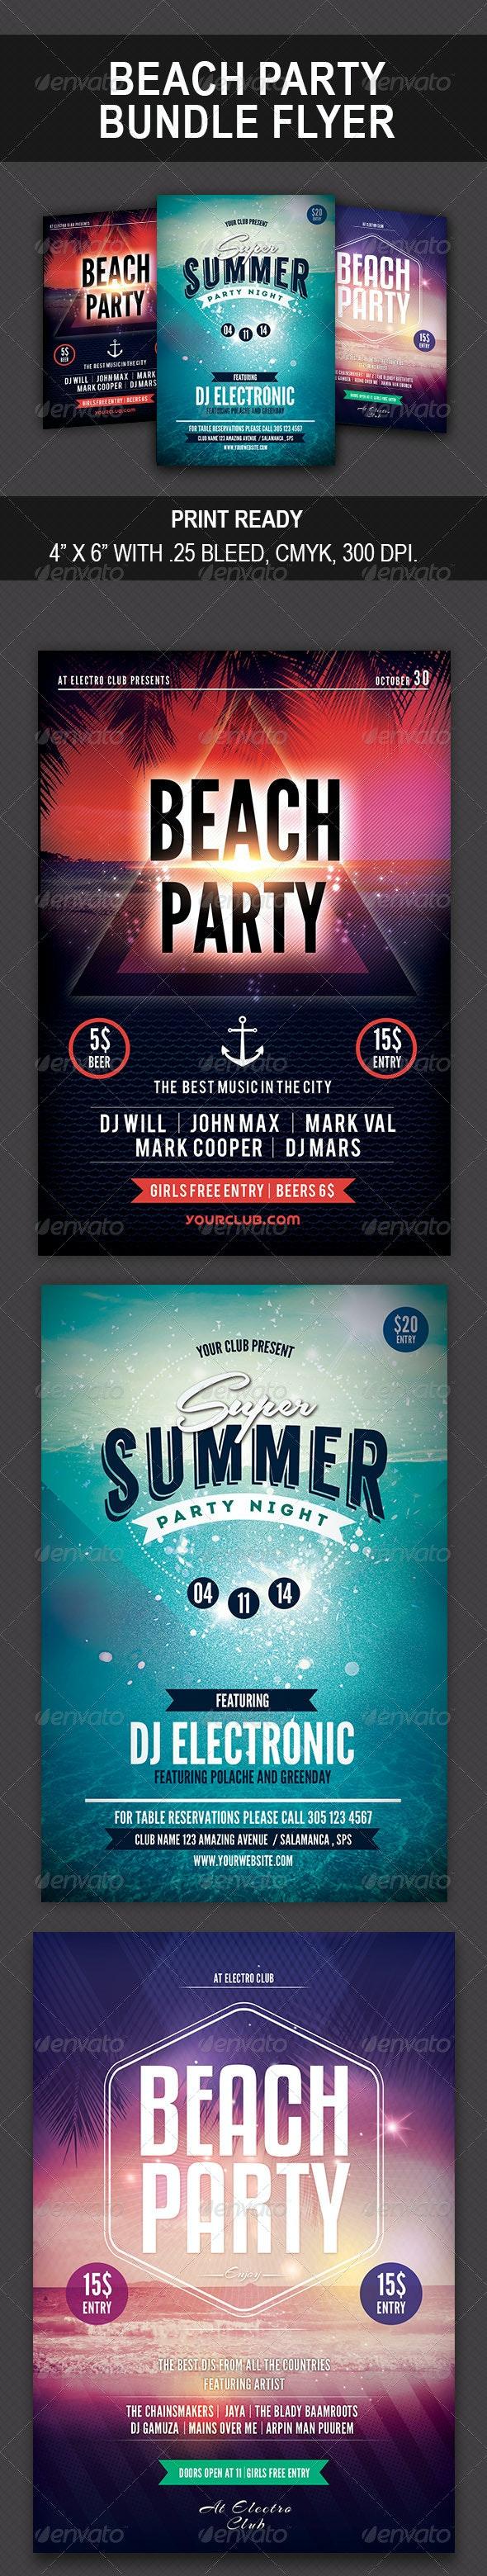 Beach Party Bundle Flyer - Events Flyers